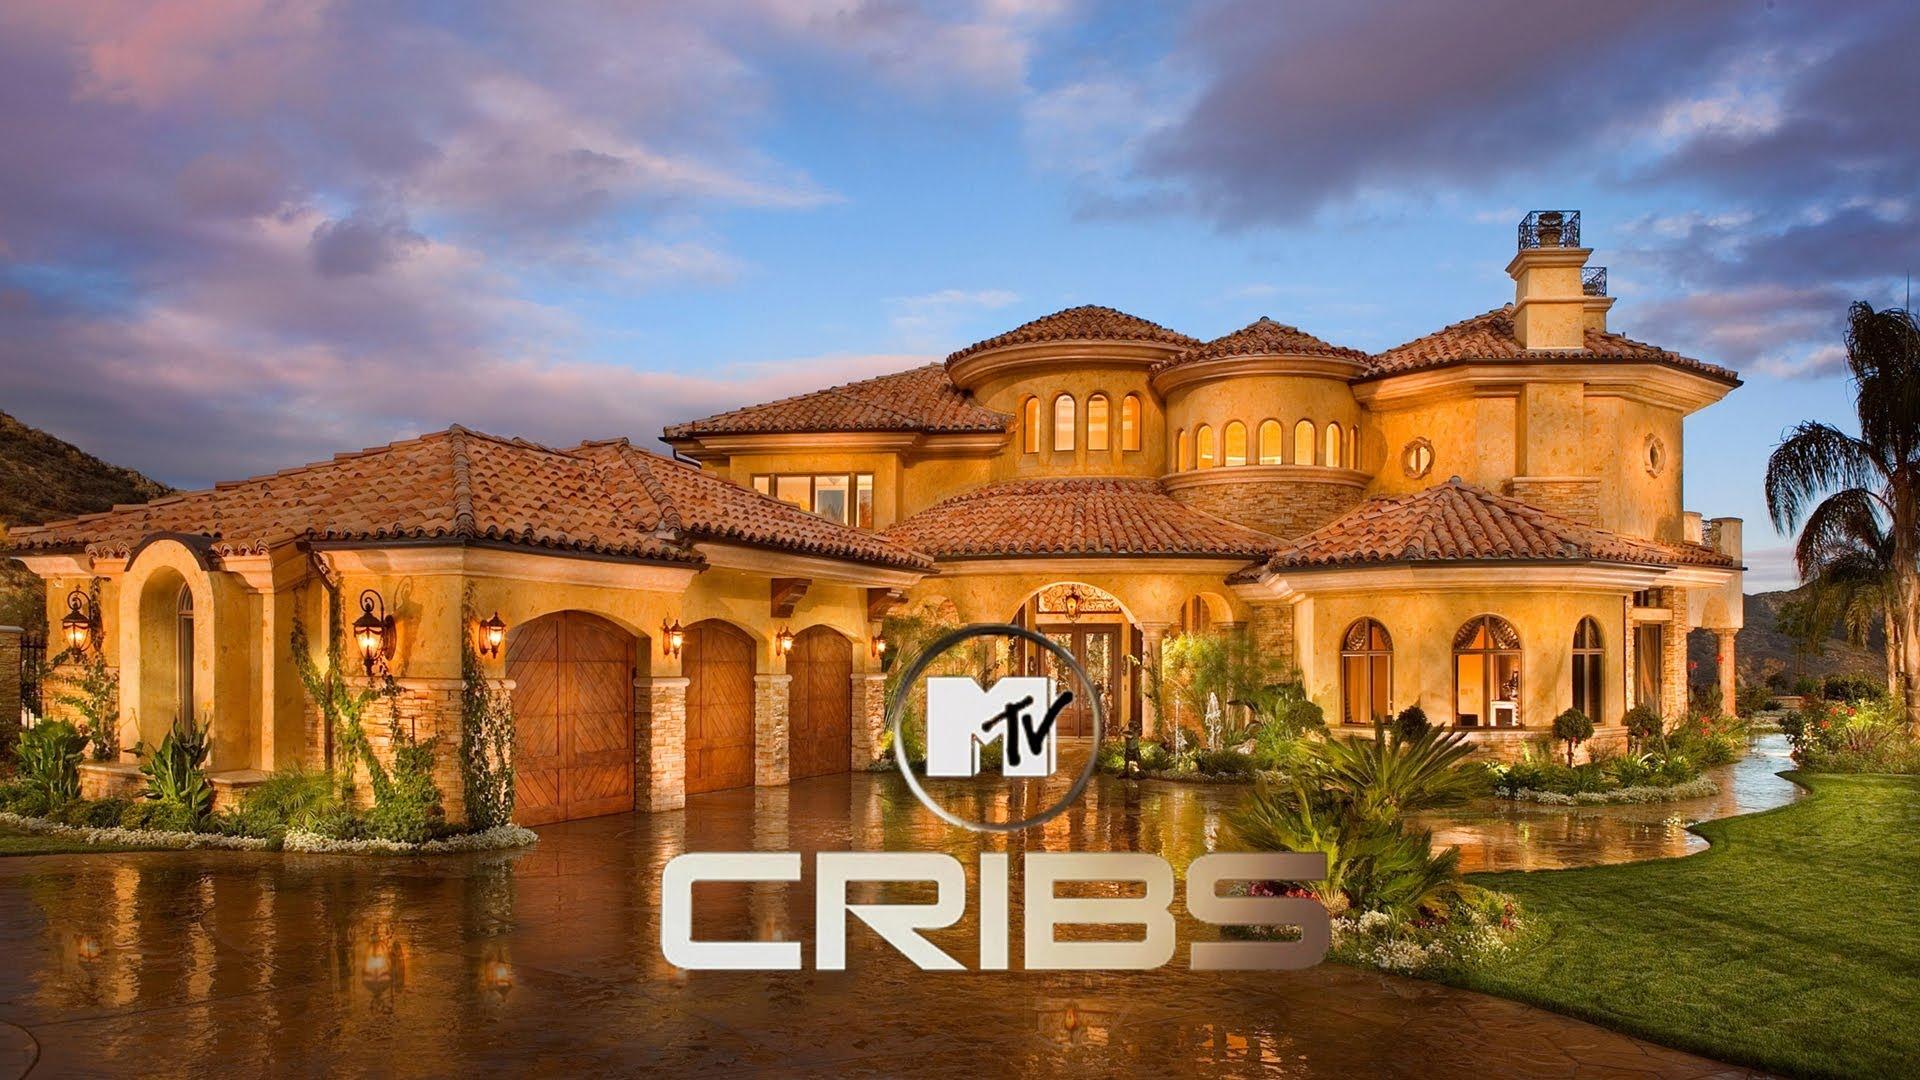 Cribs MTV